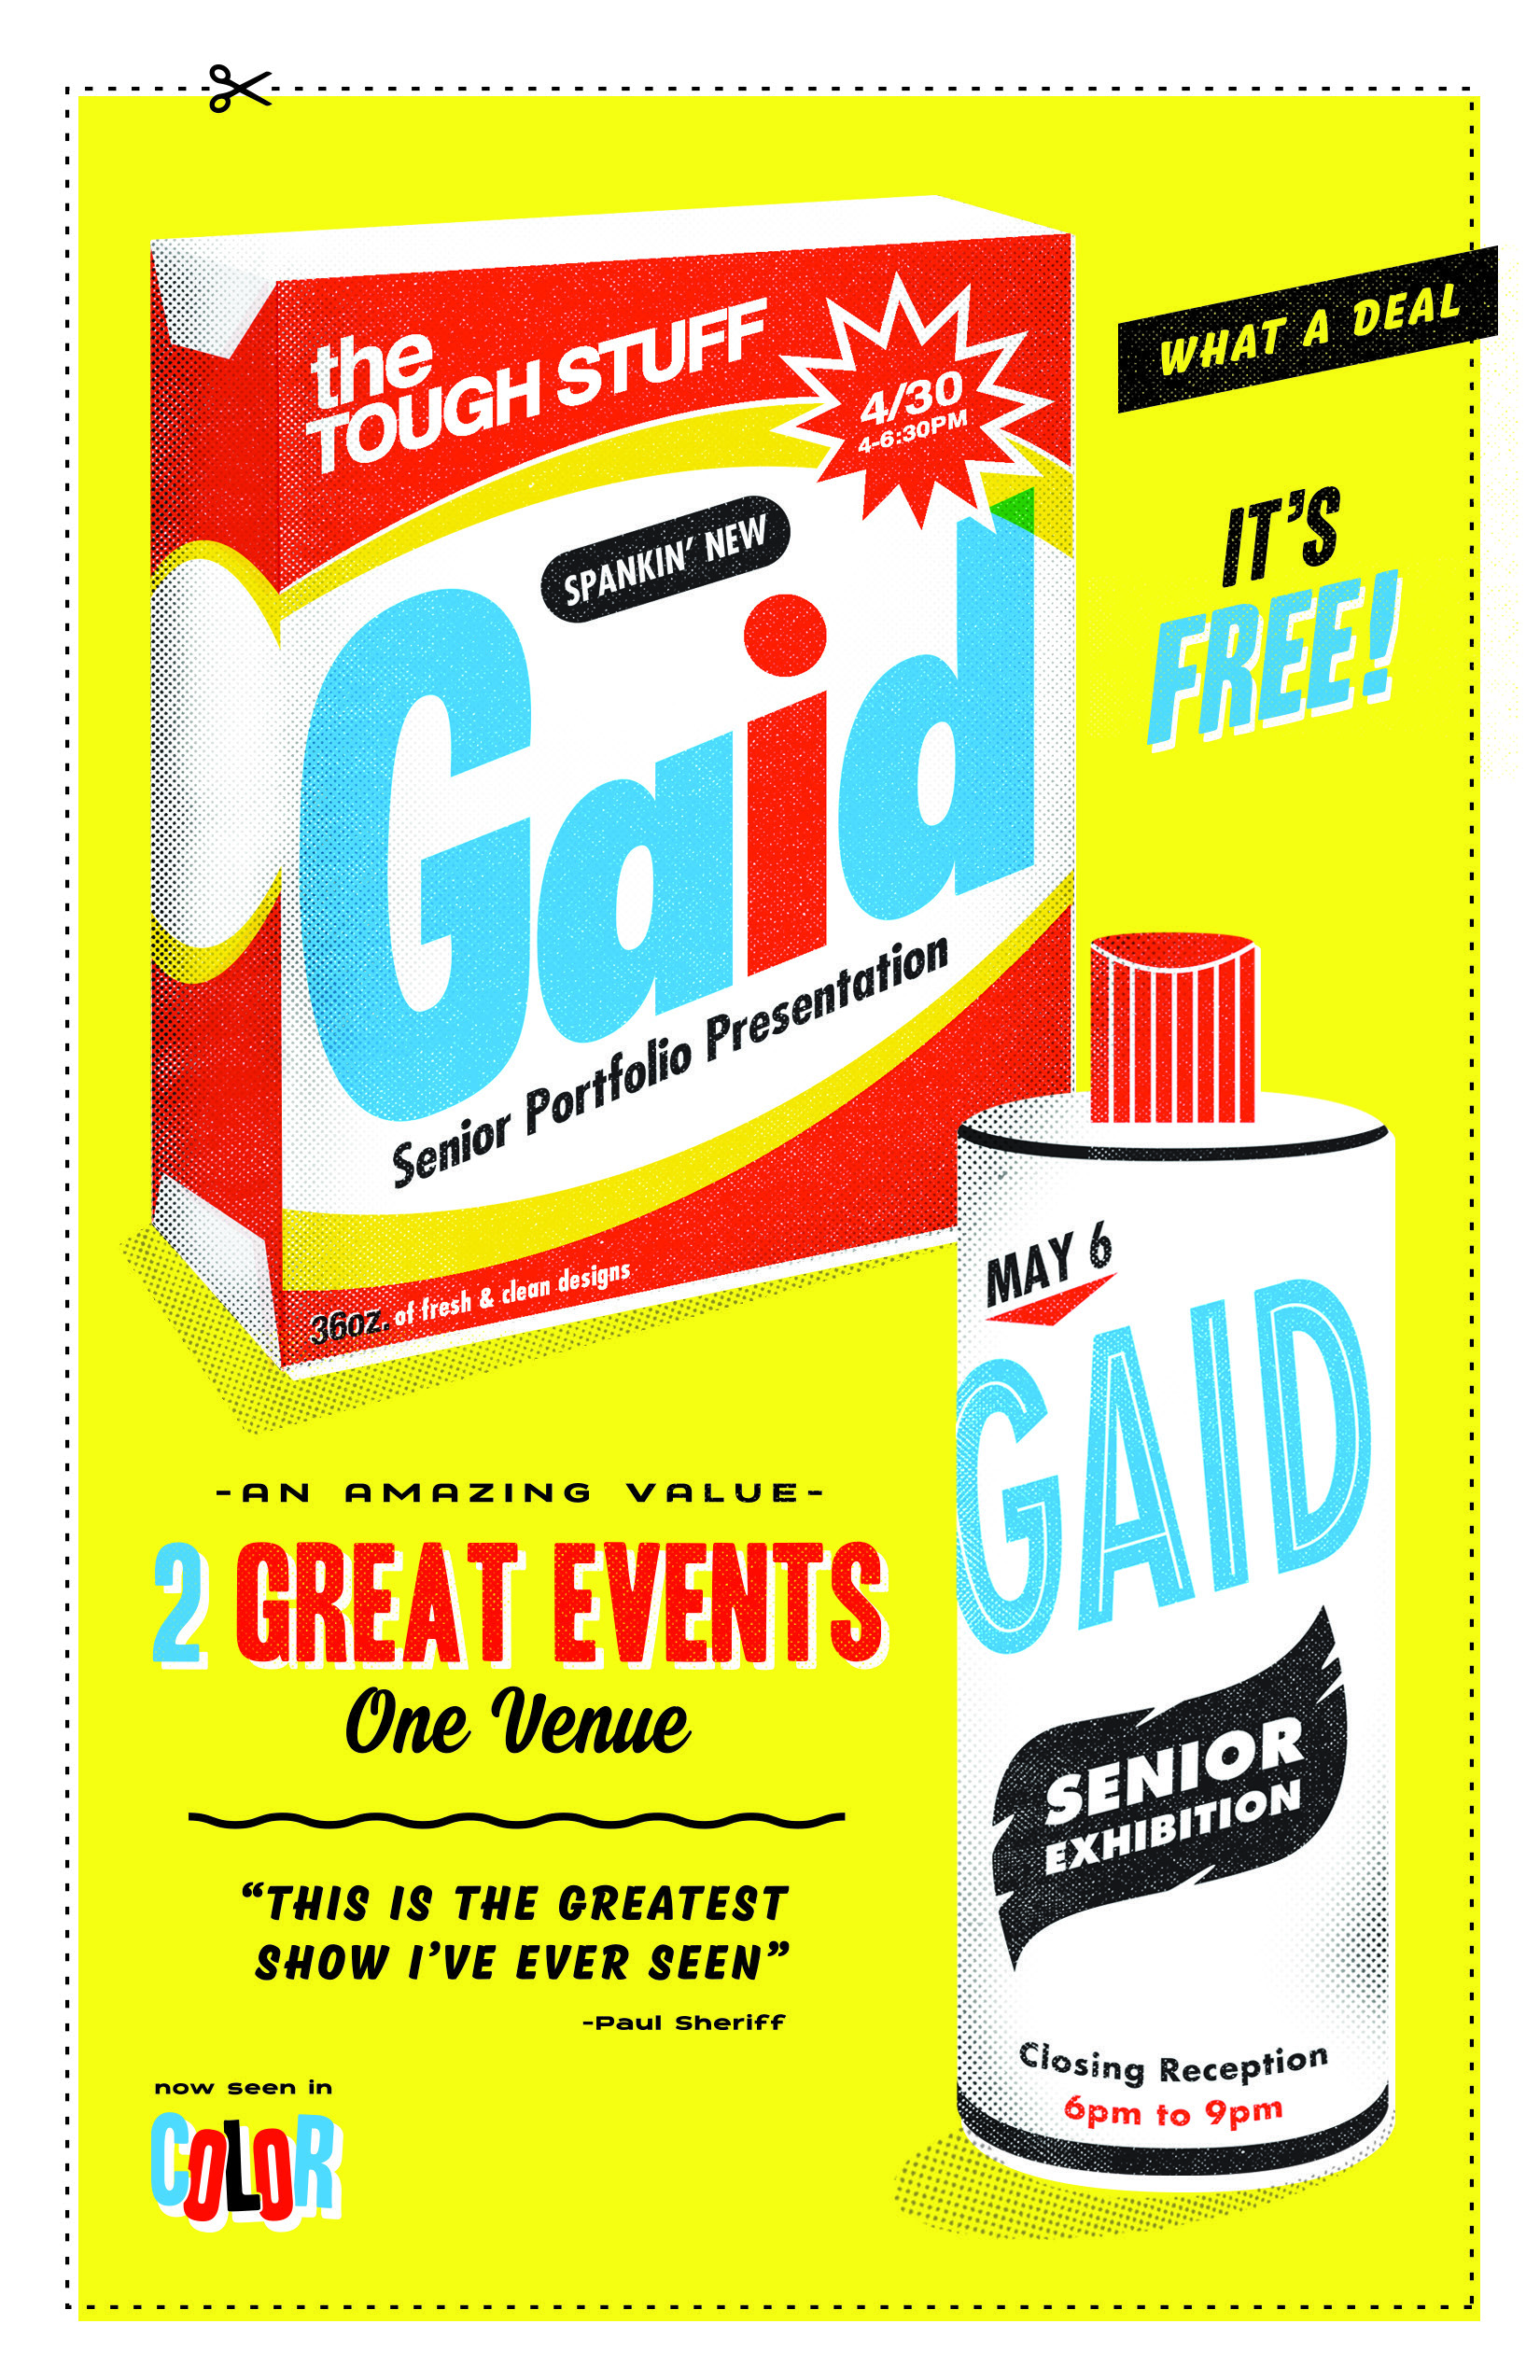 FRONT_GAID_INVITATION